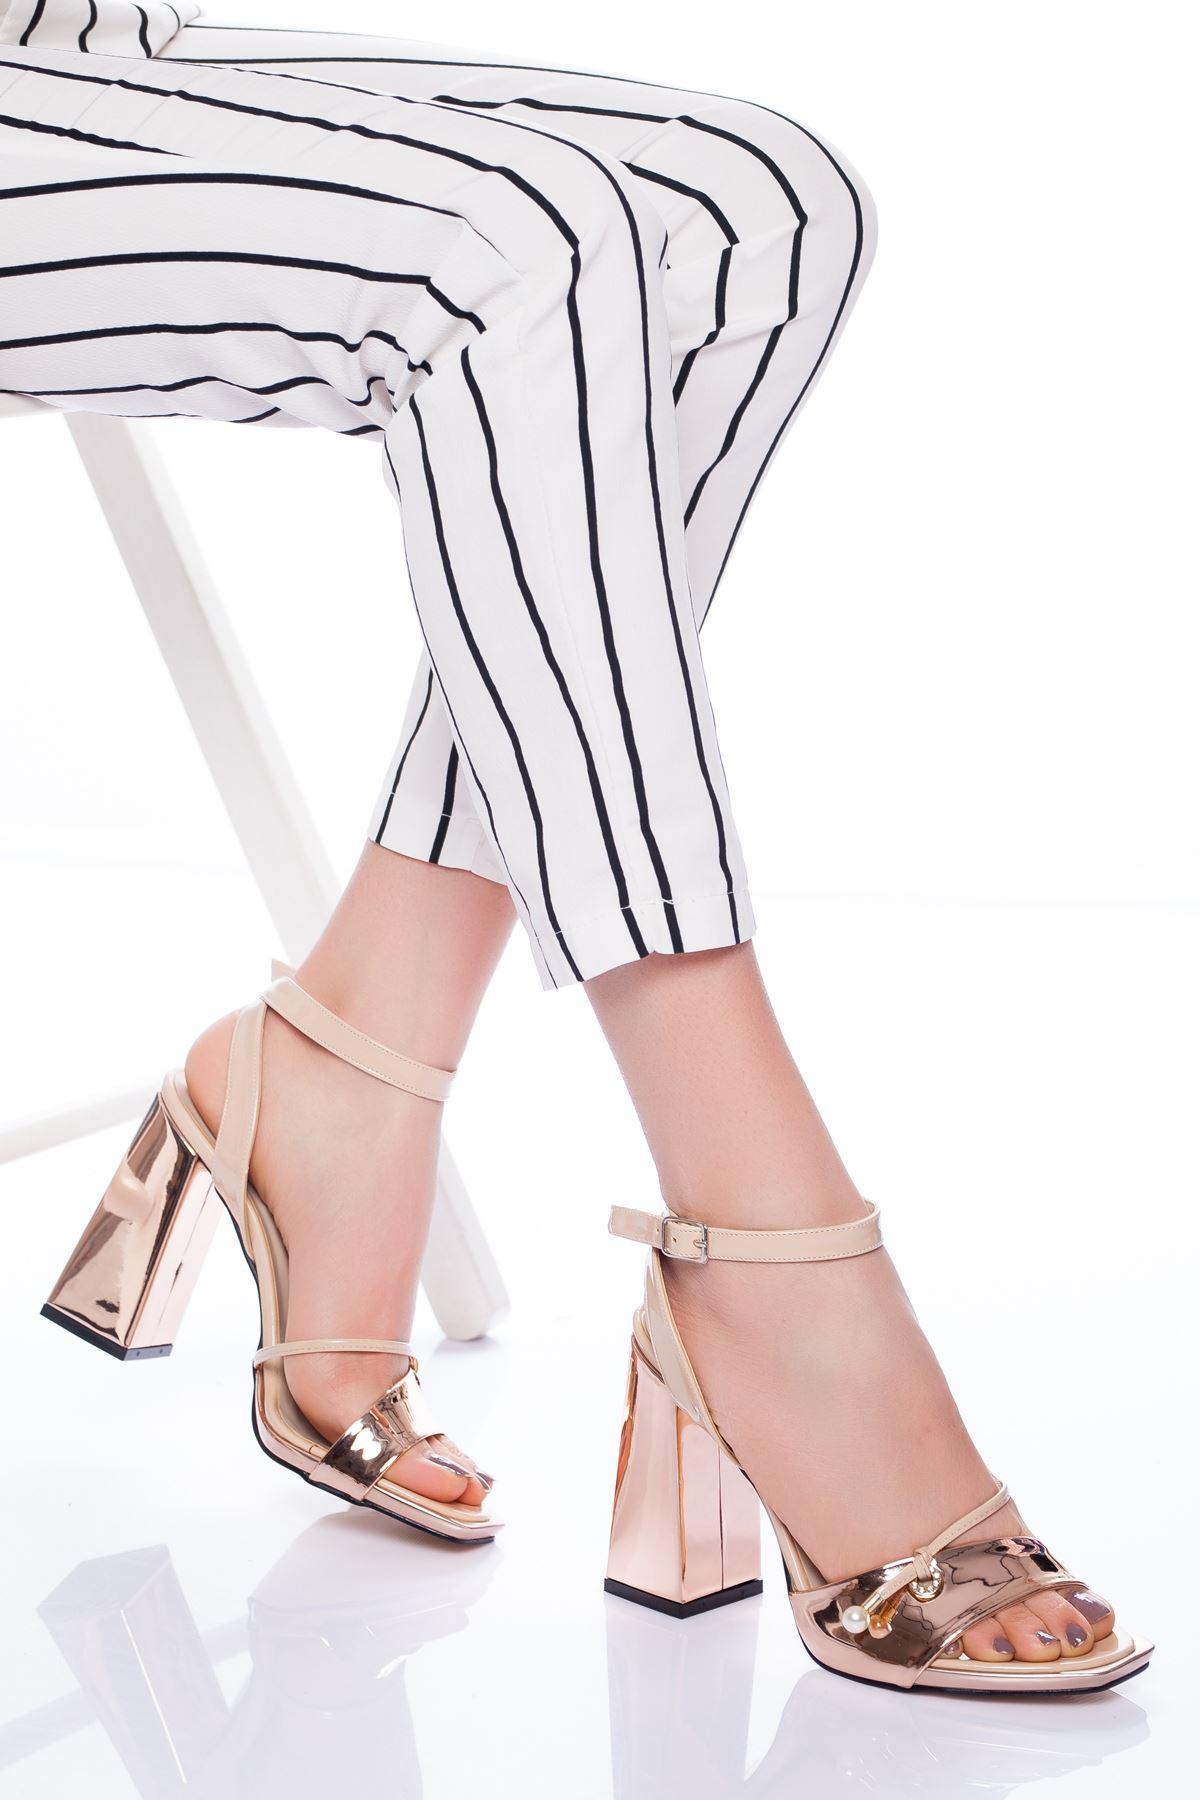 Doyle Topuklu Ayakkabı ROSE